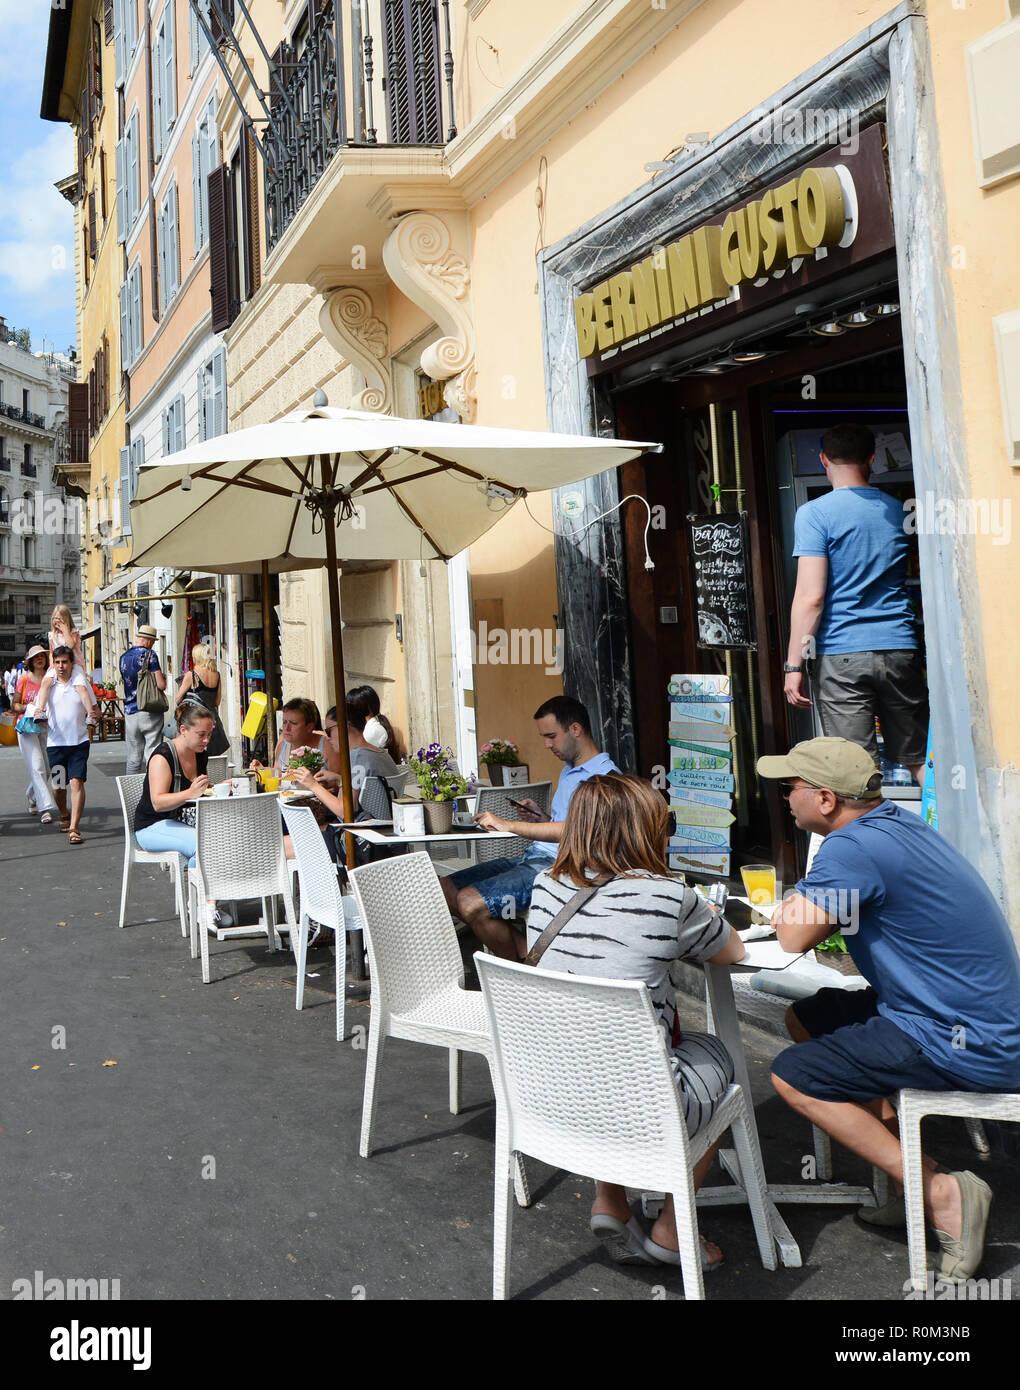 Bernini Gusto espresso bar in Piazza Barberini in Rome. - Stock Image